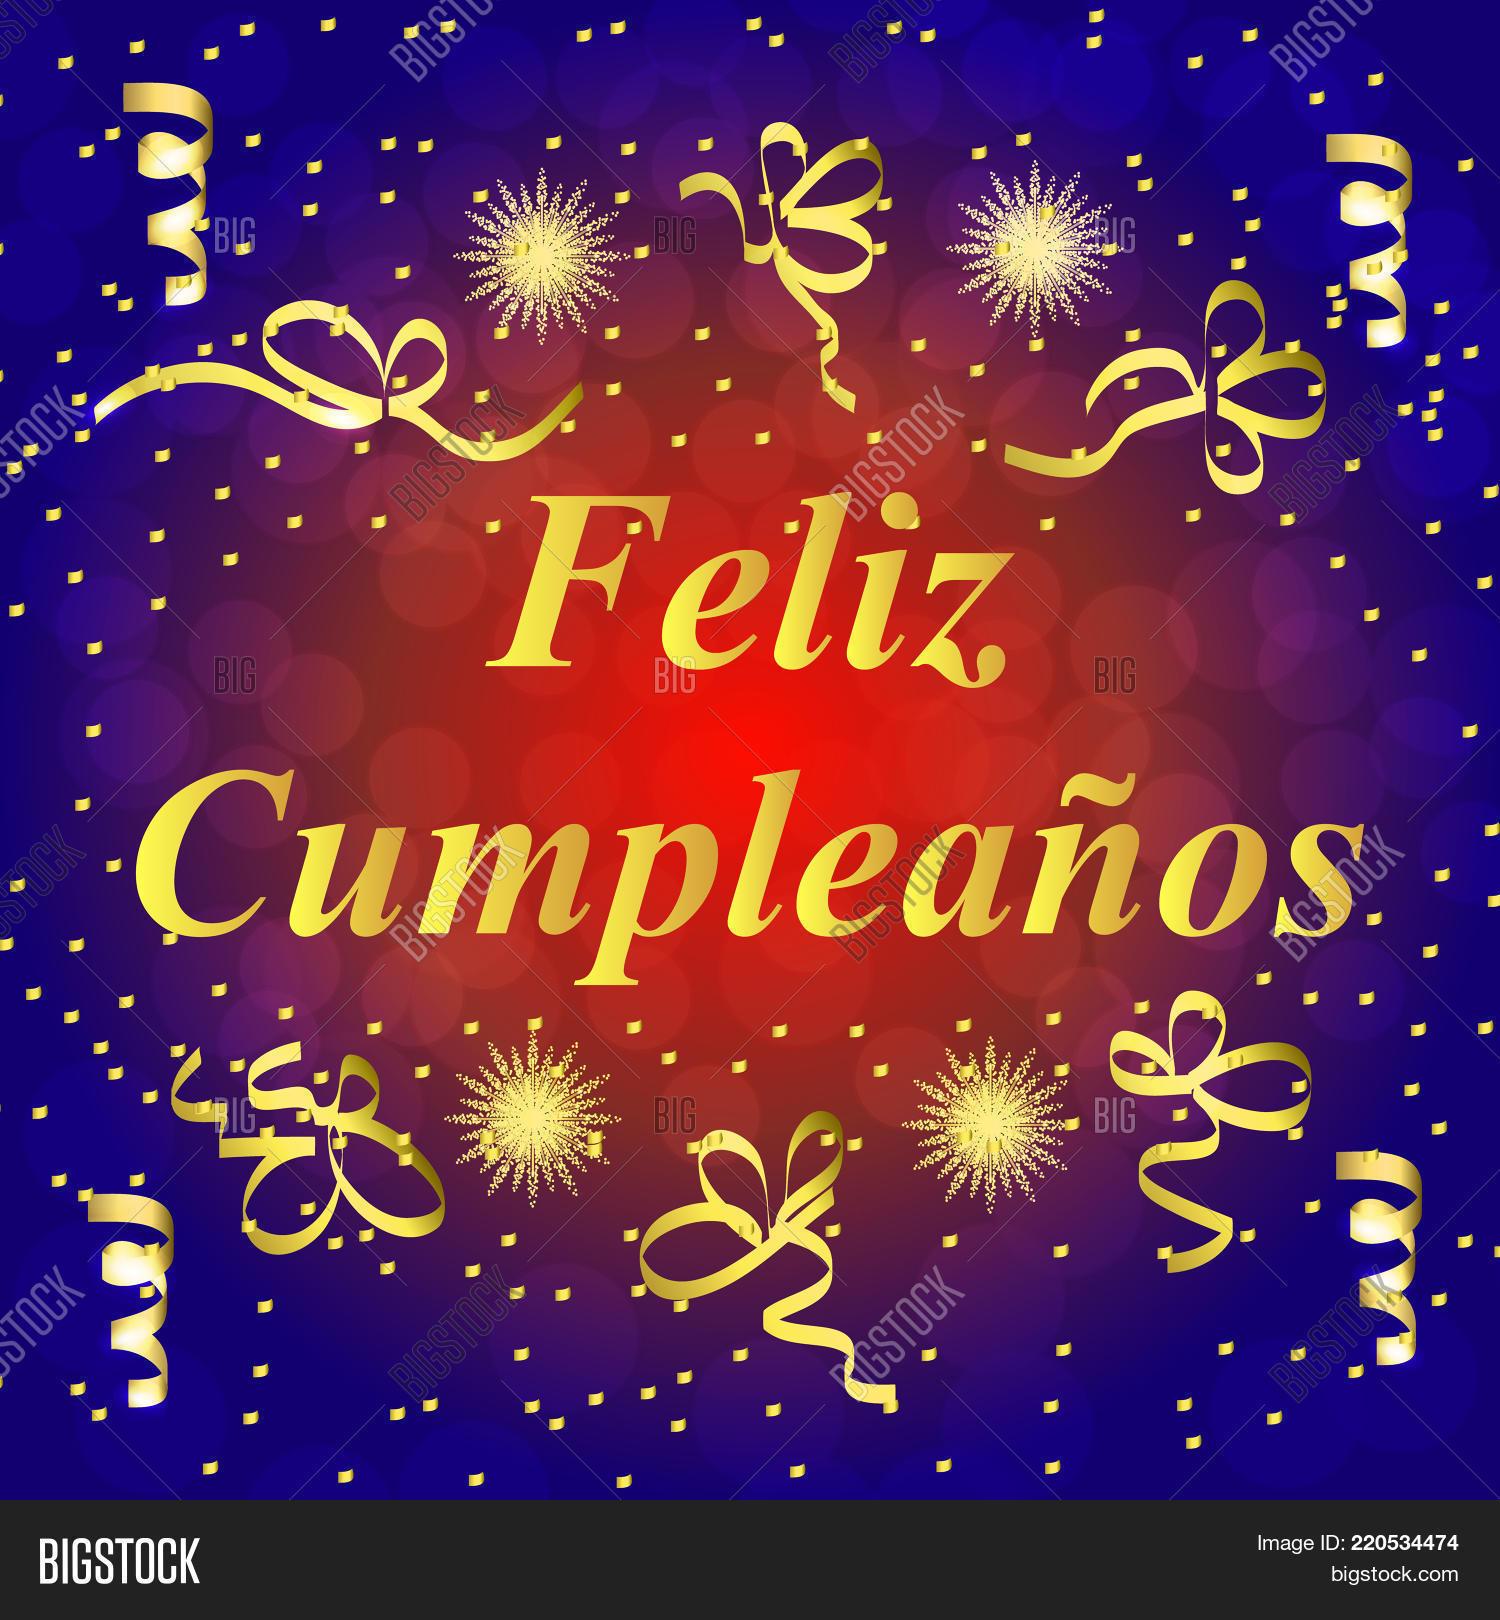 Happy Birthday Spanish Image Photo Free Trial Bigstock